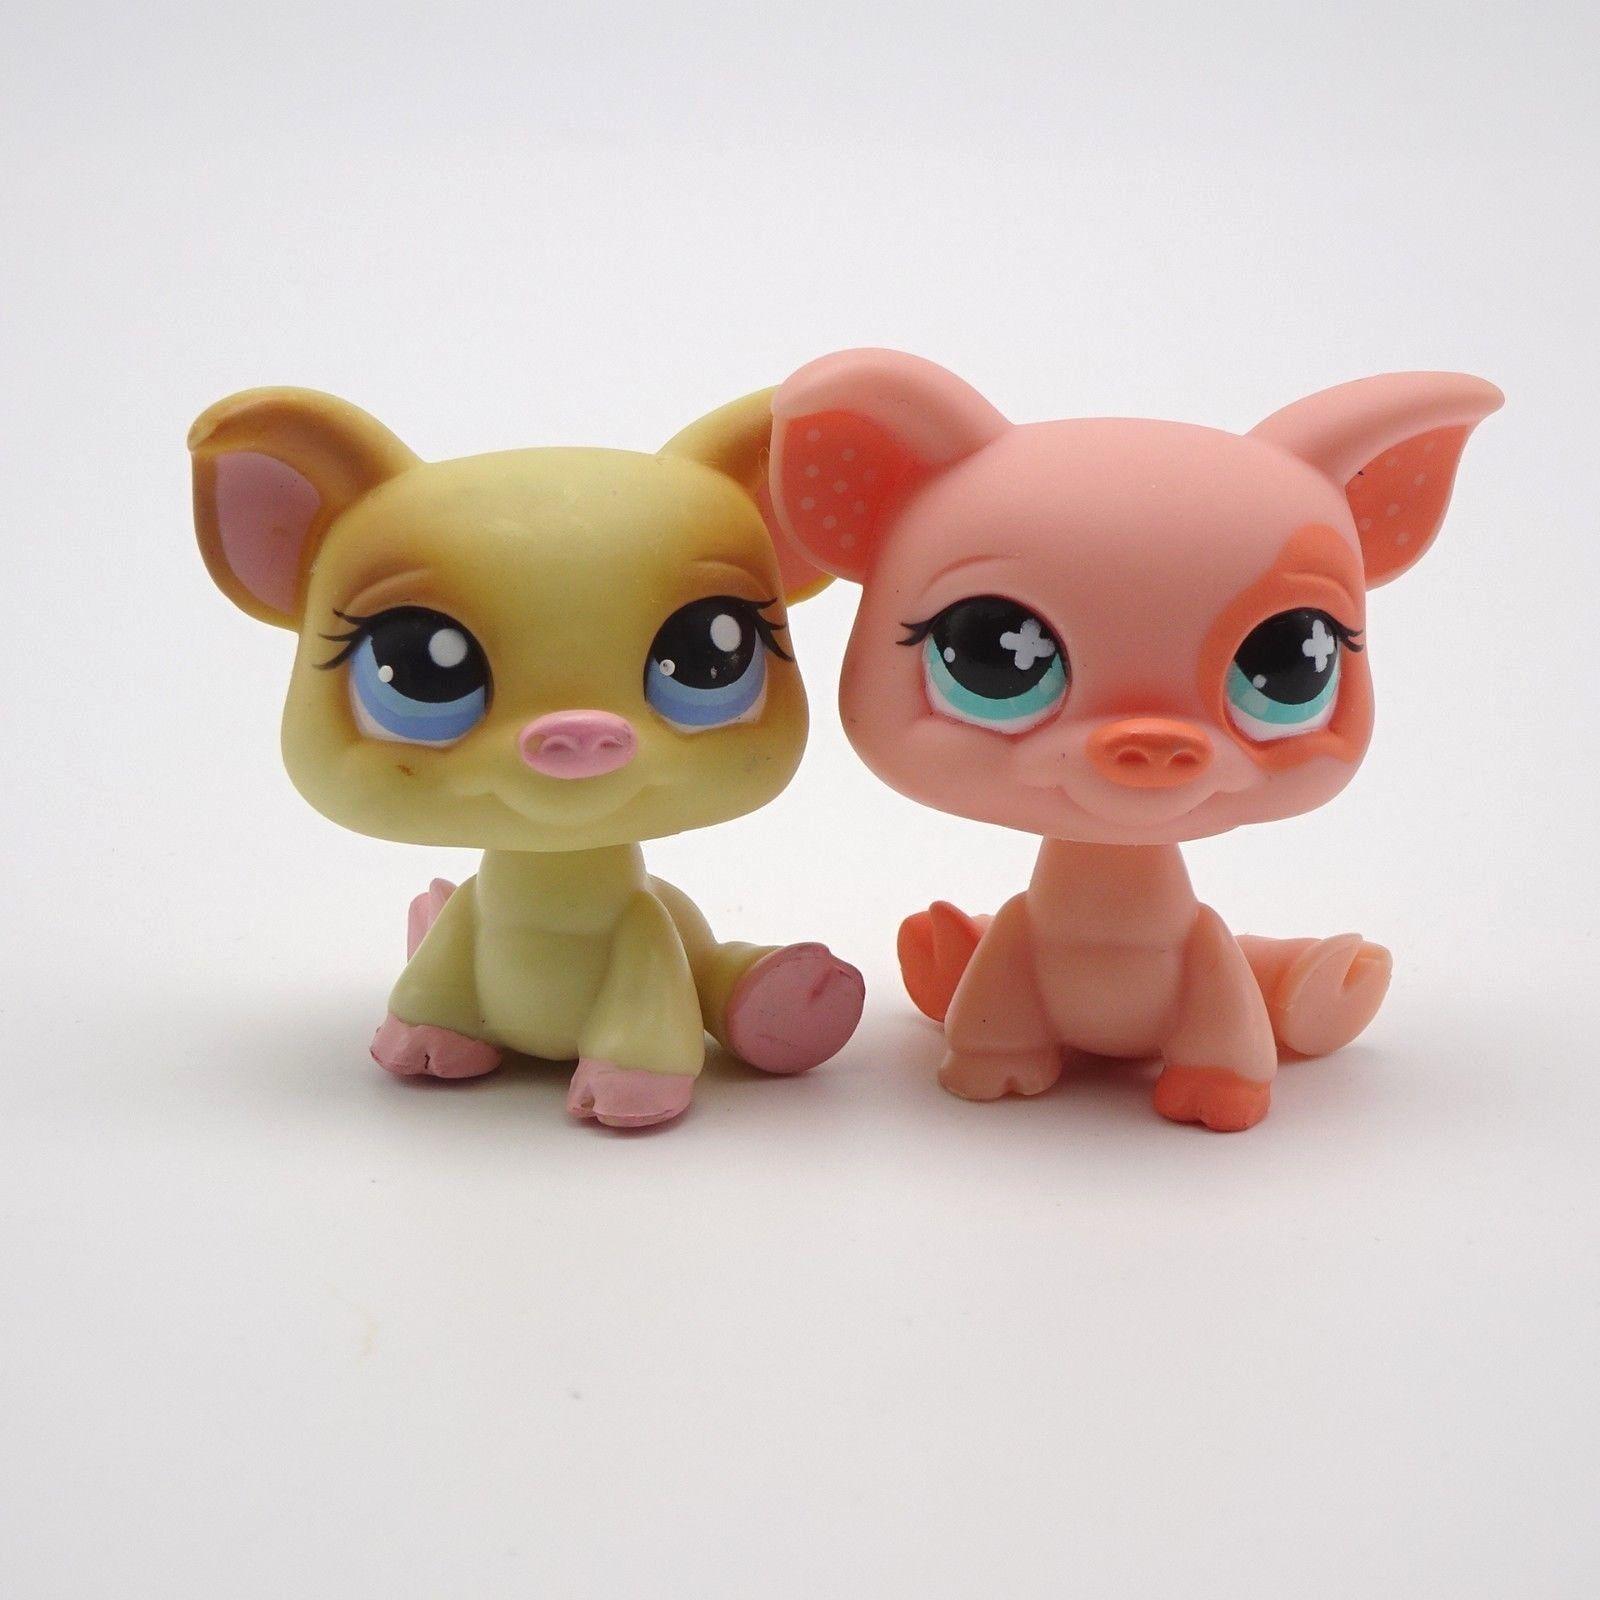 Littlest Pet Shop Lot 2 Little Pigs 266 Yellow 622 Pink Ebay Pet Pig Care Dog Toys Pet Pigs